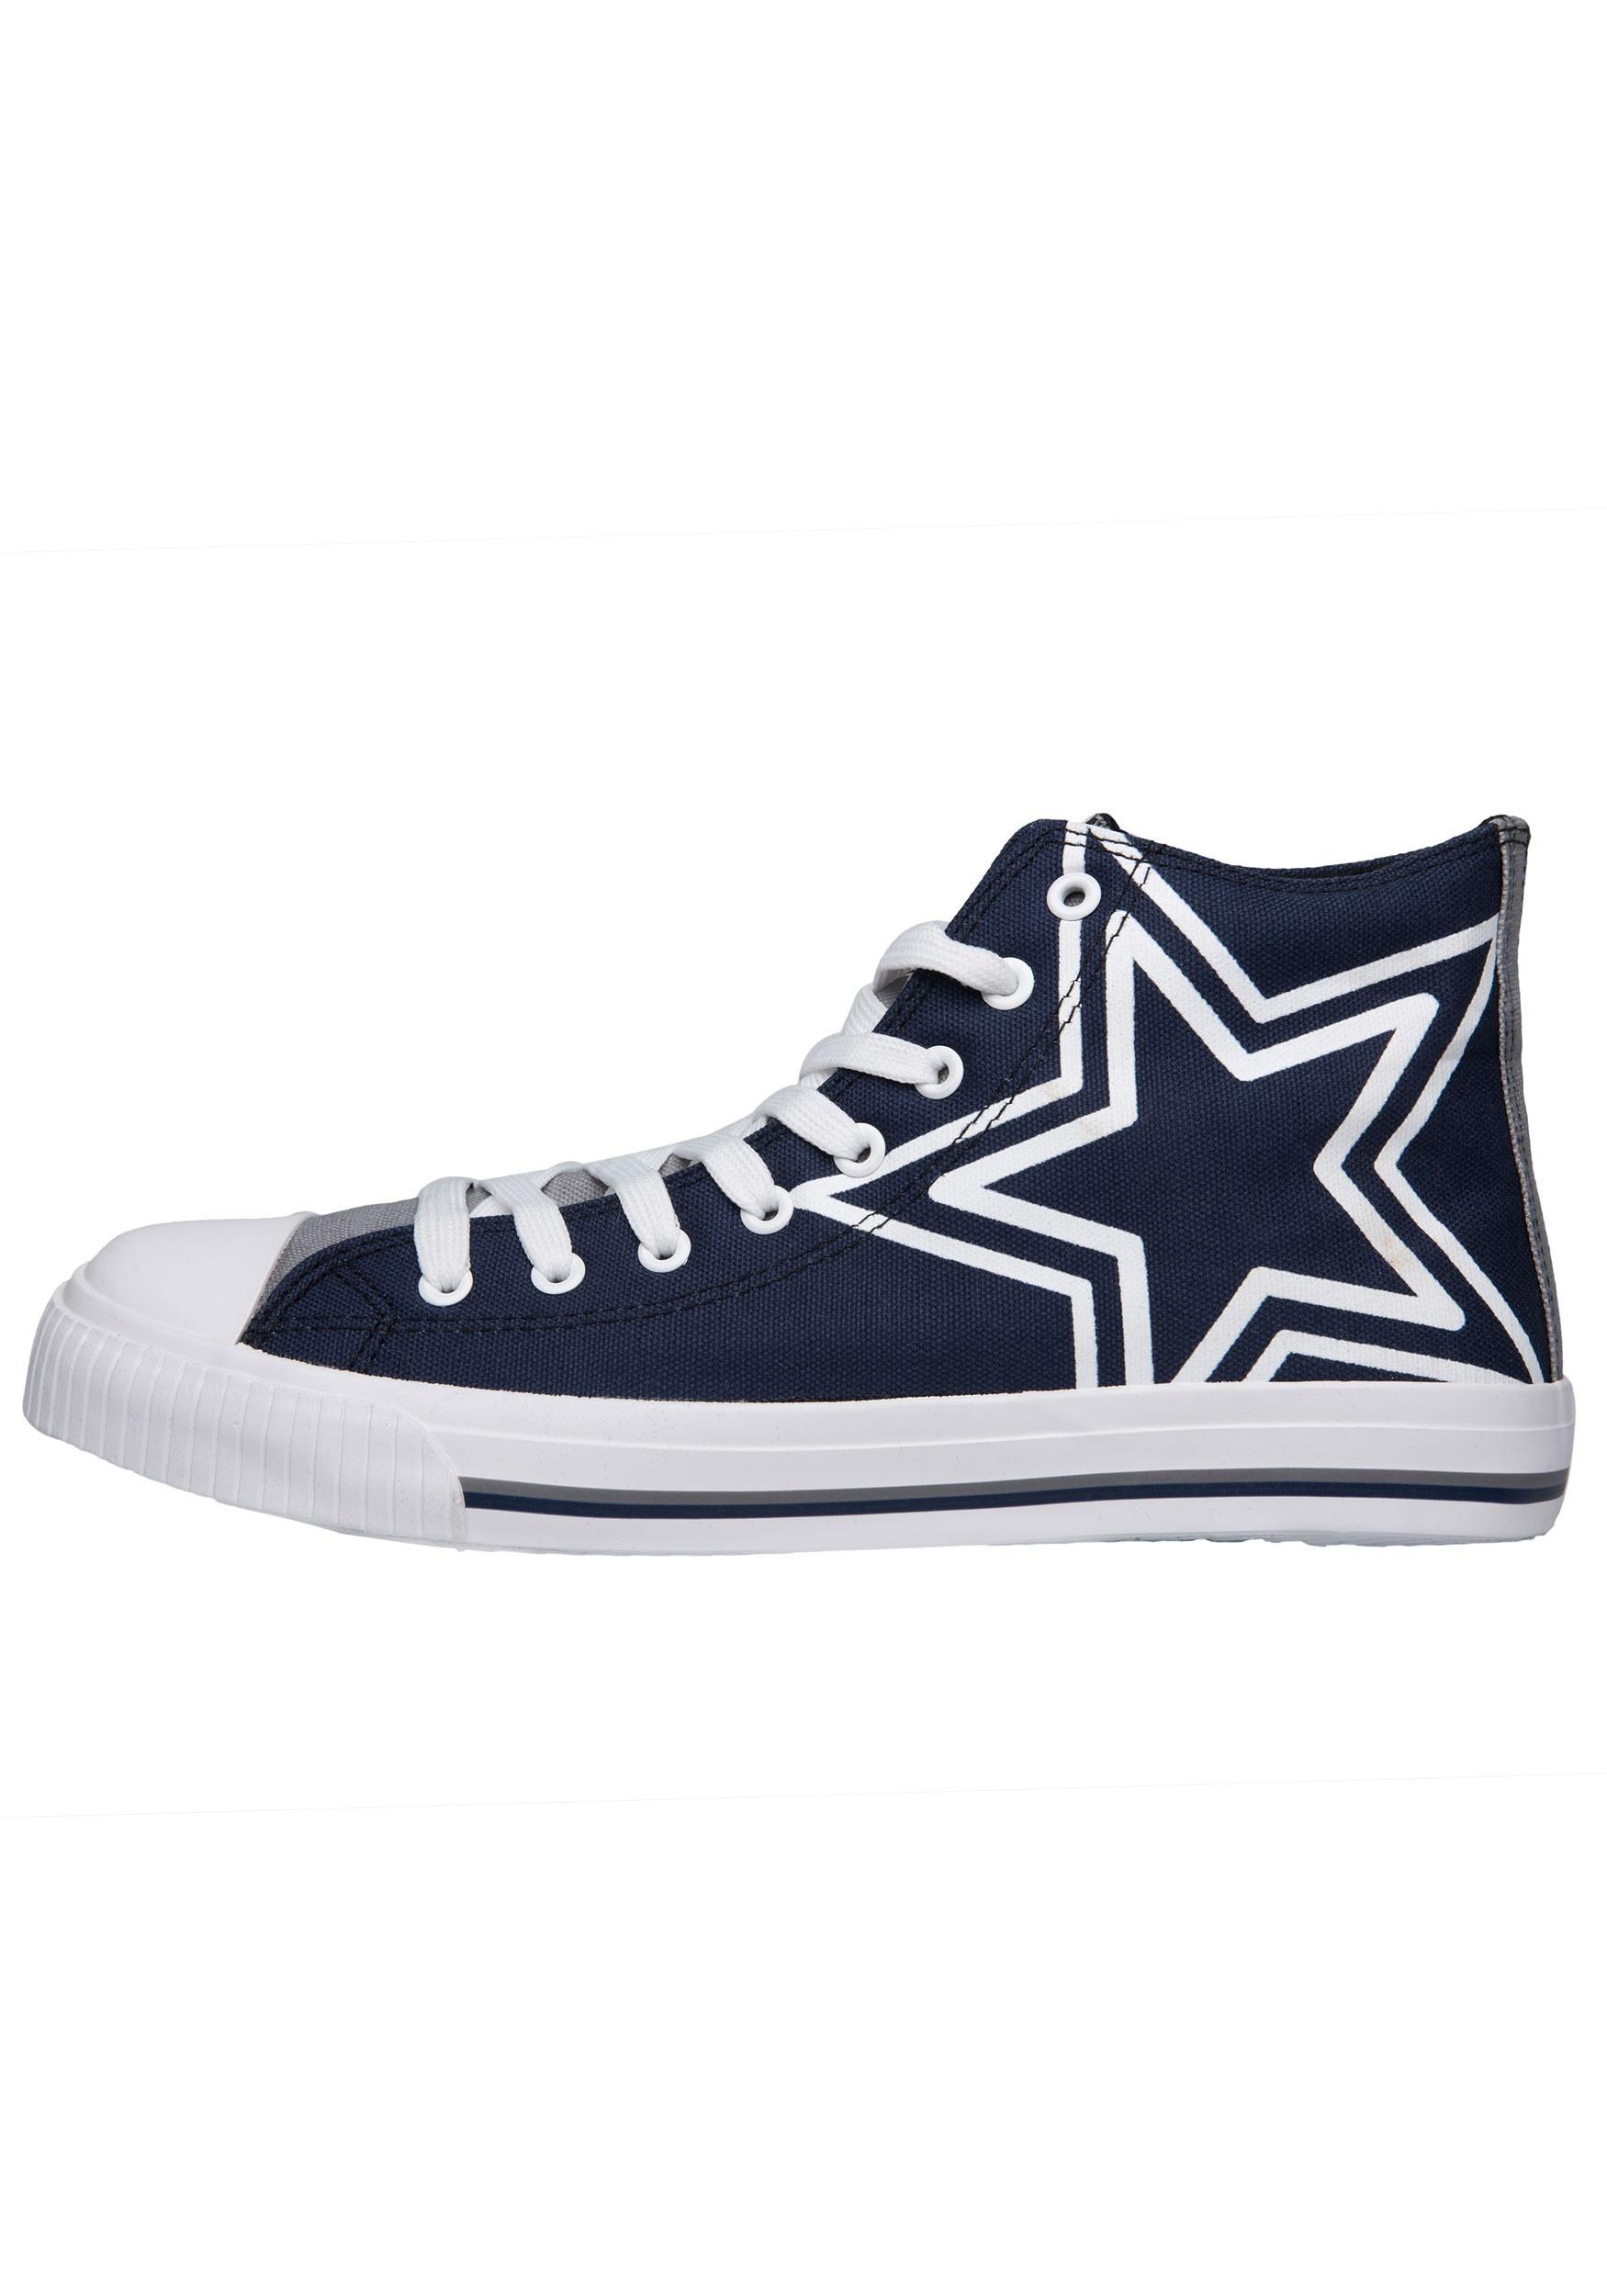 Dallas Cowboys High Top Big Logo Canvas Shoes for Men